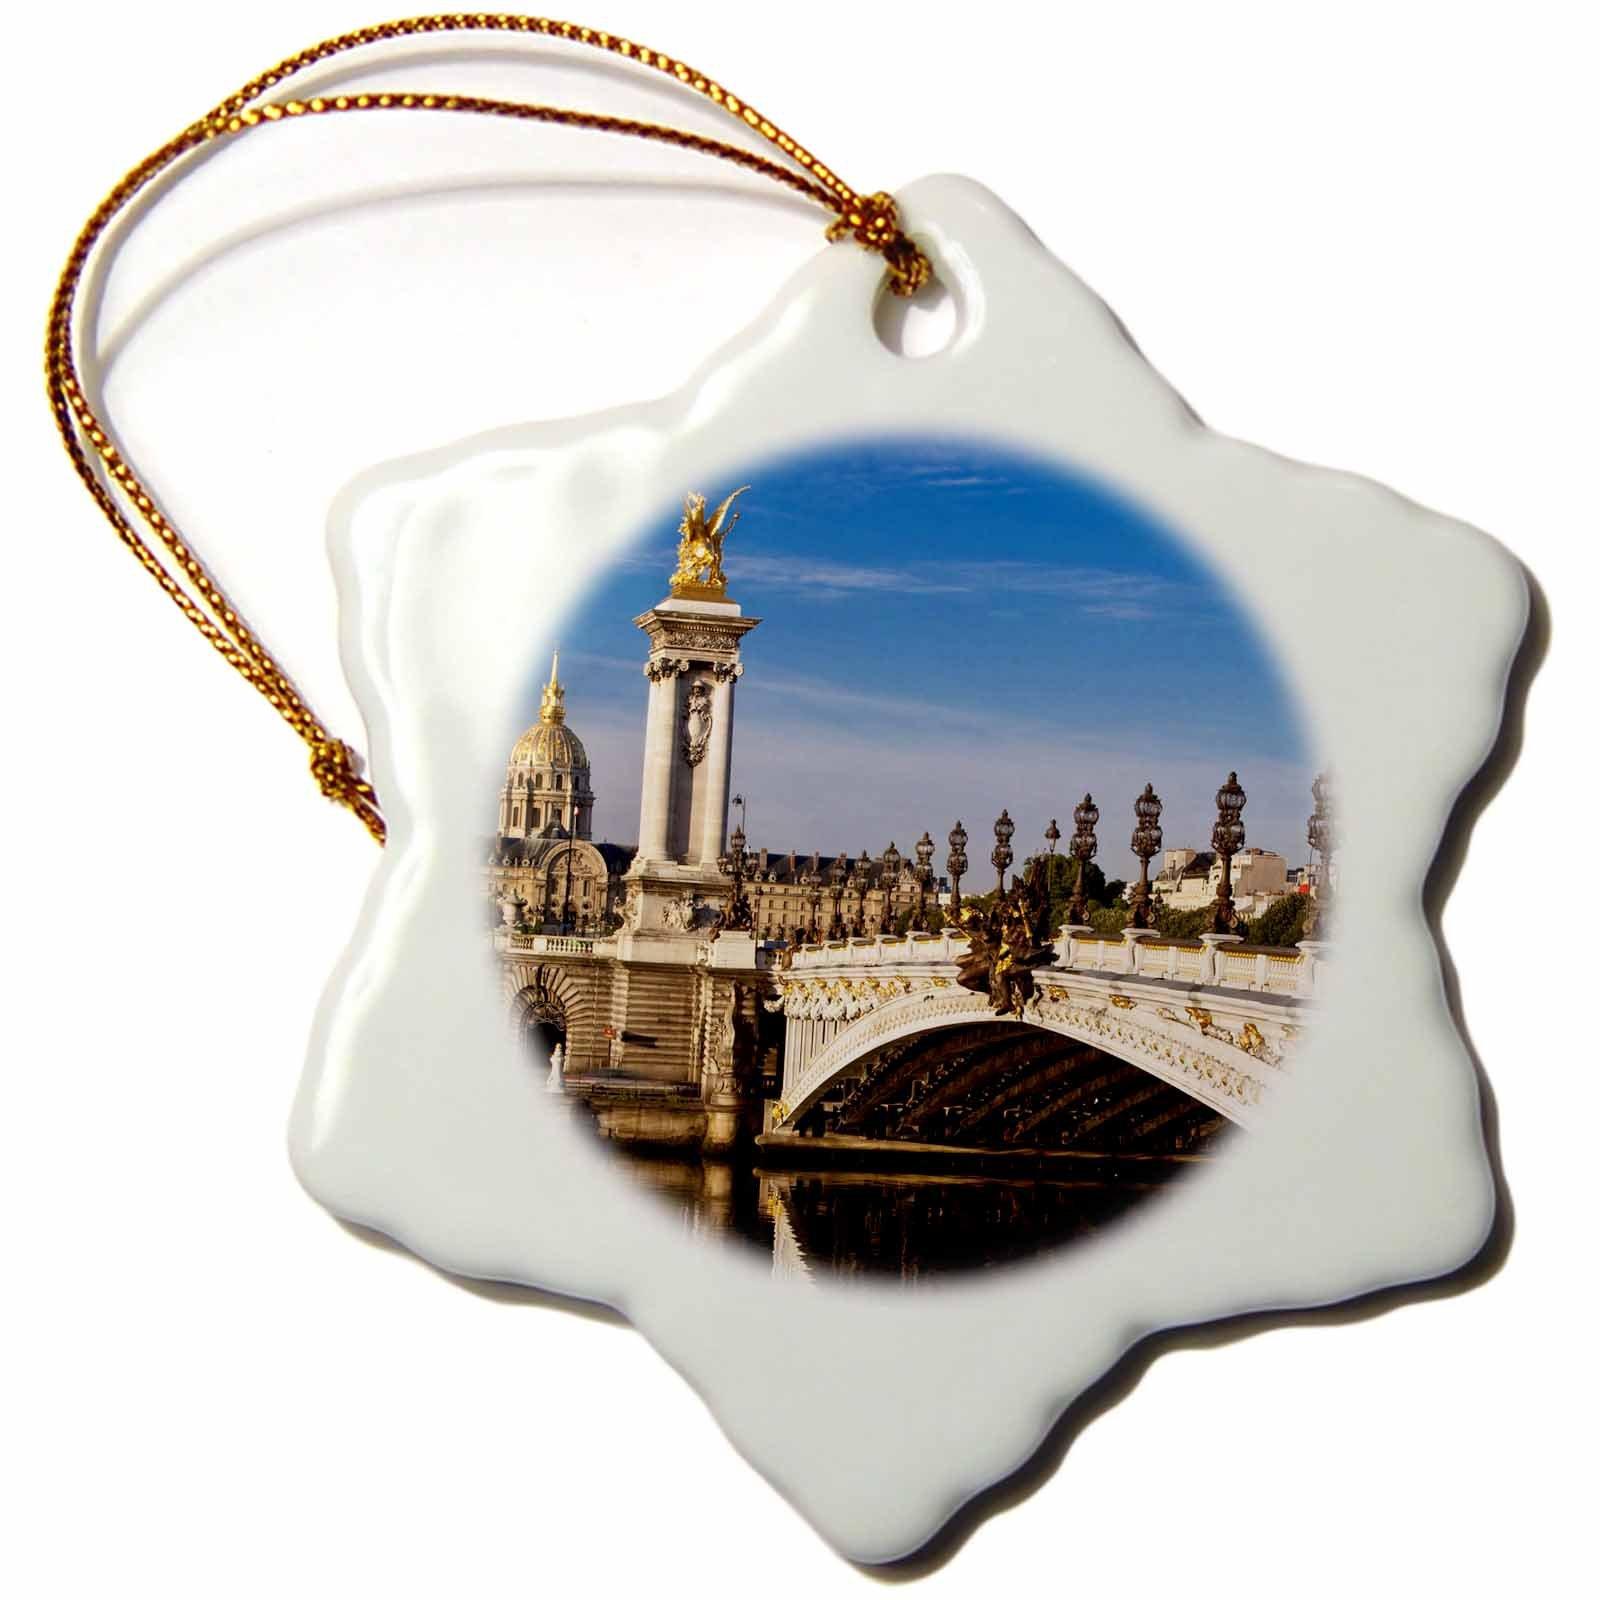 3dRose orn_136036_1 River Seine, Hotel Les Invalides, Paris, France Eu09 Bjn0282 Brian Jannsen Snowflake Ornament, Porcelain, 3-Inch